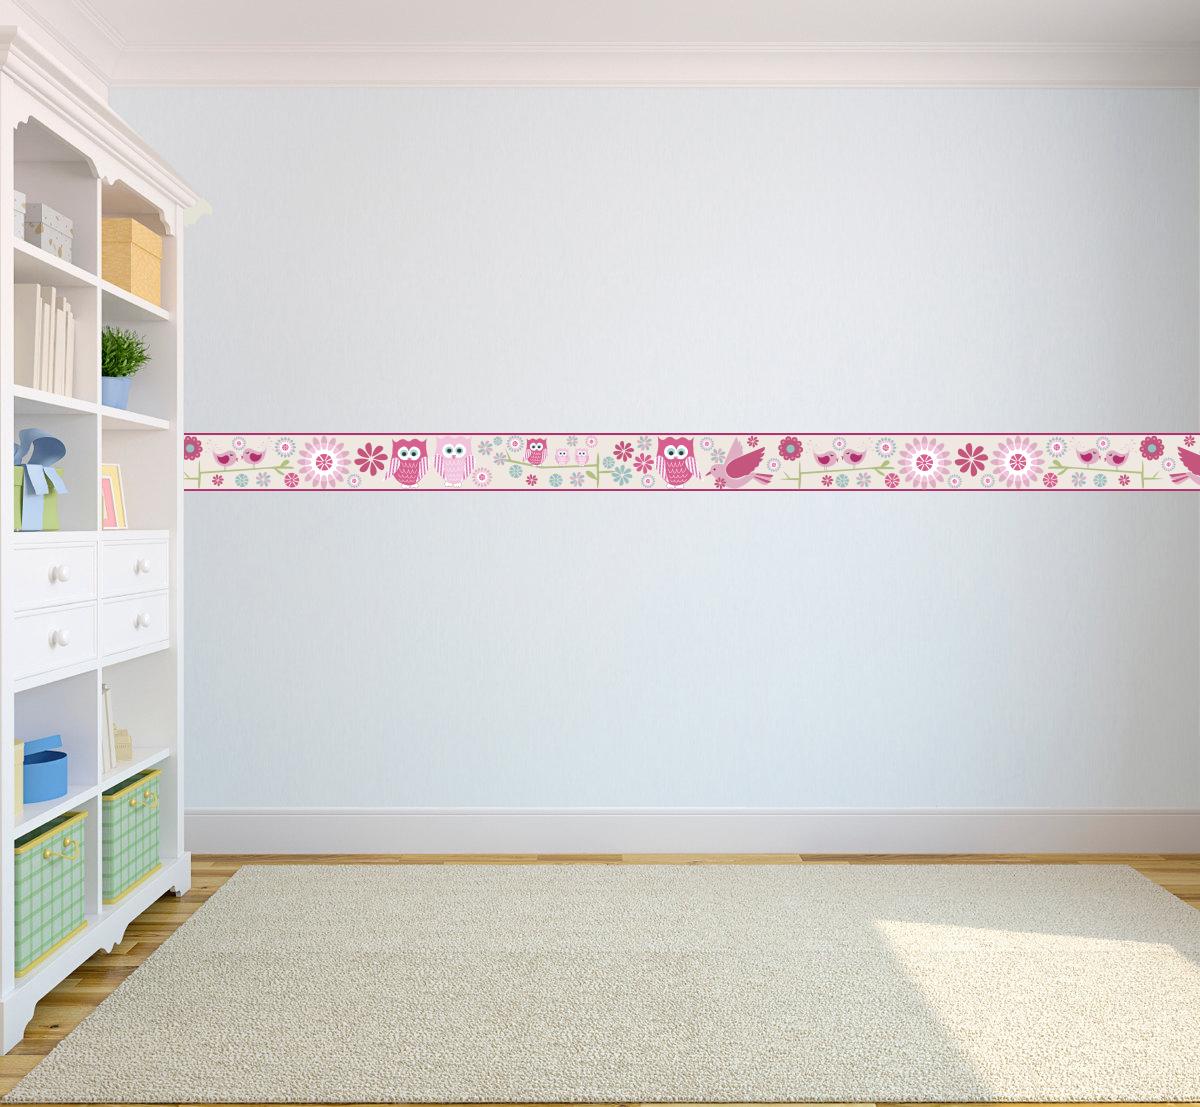 wallpaper borders children 39 s kids nursery boys girls bedroom wall self